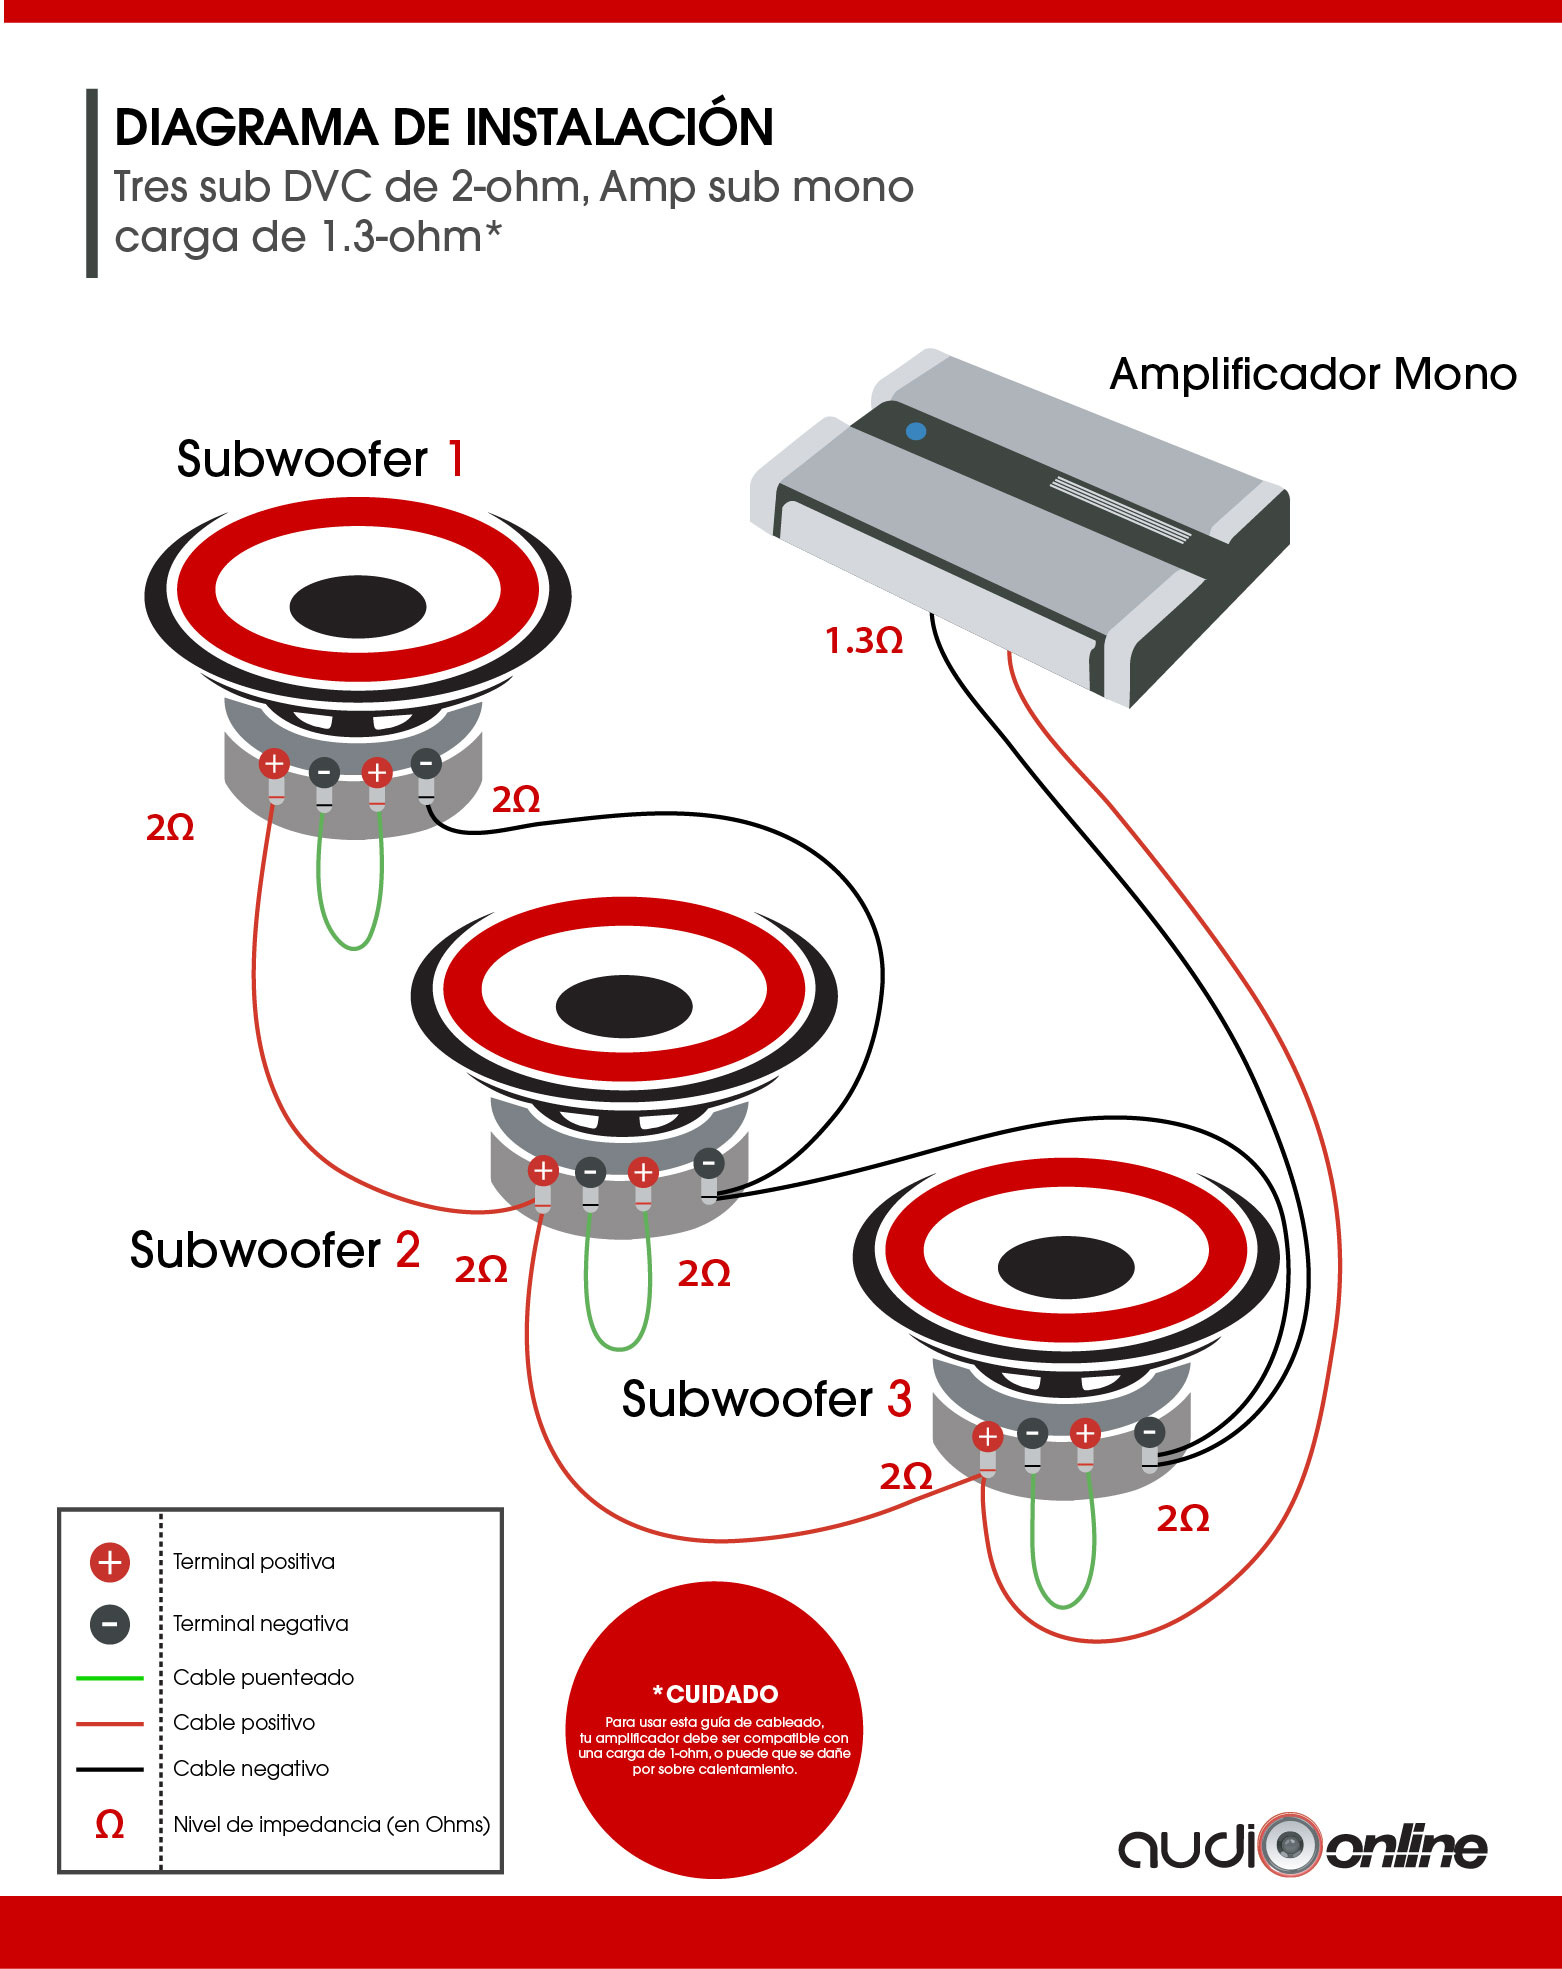 3-DVC-2-ohm-mono-low-imp  Ohm Dvc Wiring Diagram Crutchfield on mono amp 2, 4x12 speaker cabinet, crutchfield amp,